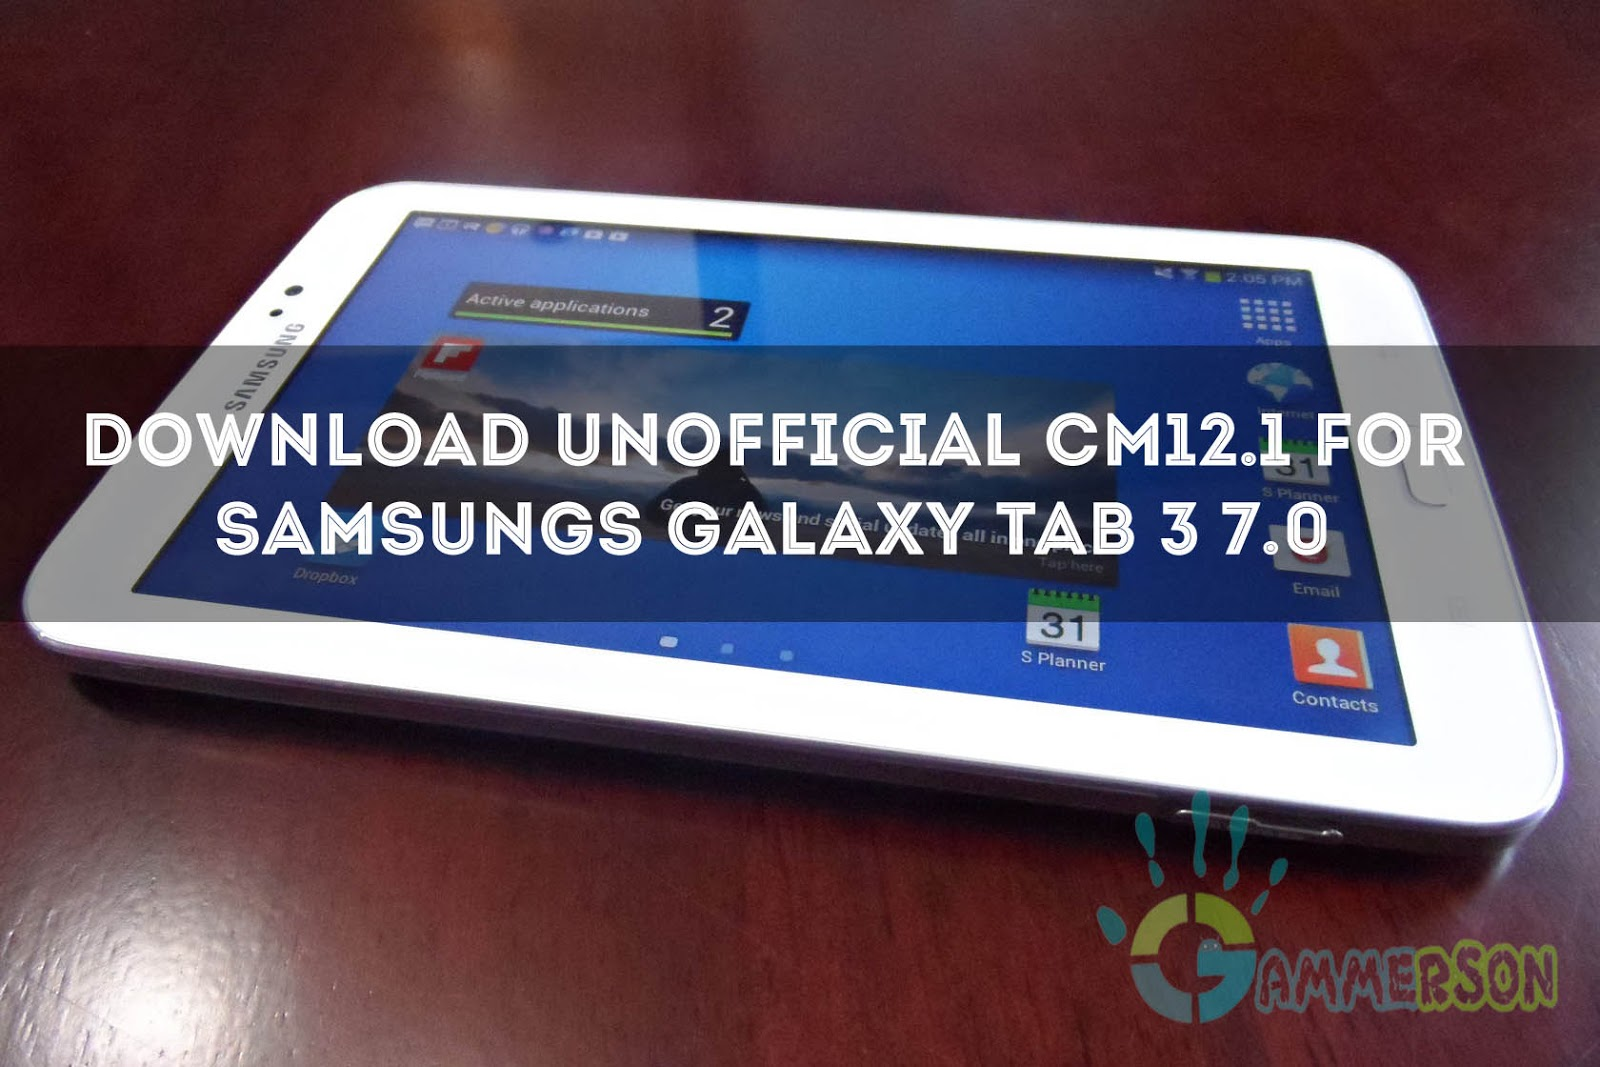 ROM] Download CM12 1 for Galaxy Tab 3 7 0 Lollipop [SM-T217s]